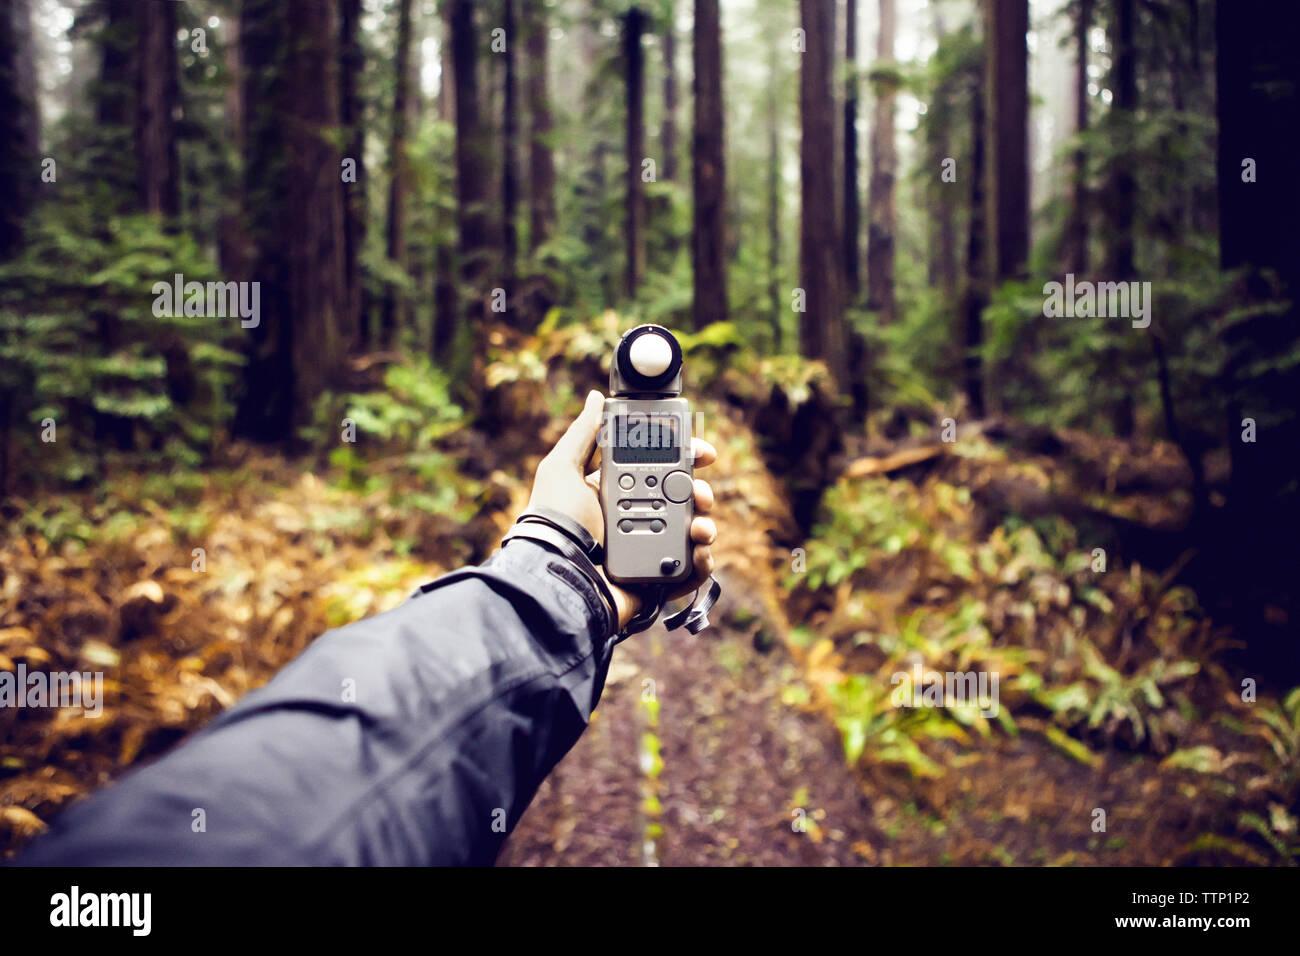 Cropped image of hiker holding navigation equipment at Humboldt Redwoods State Park - Stock Image